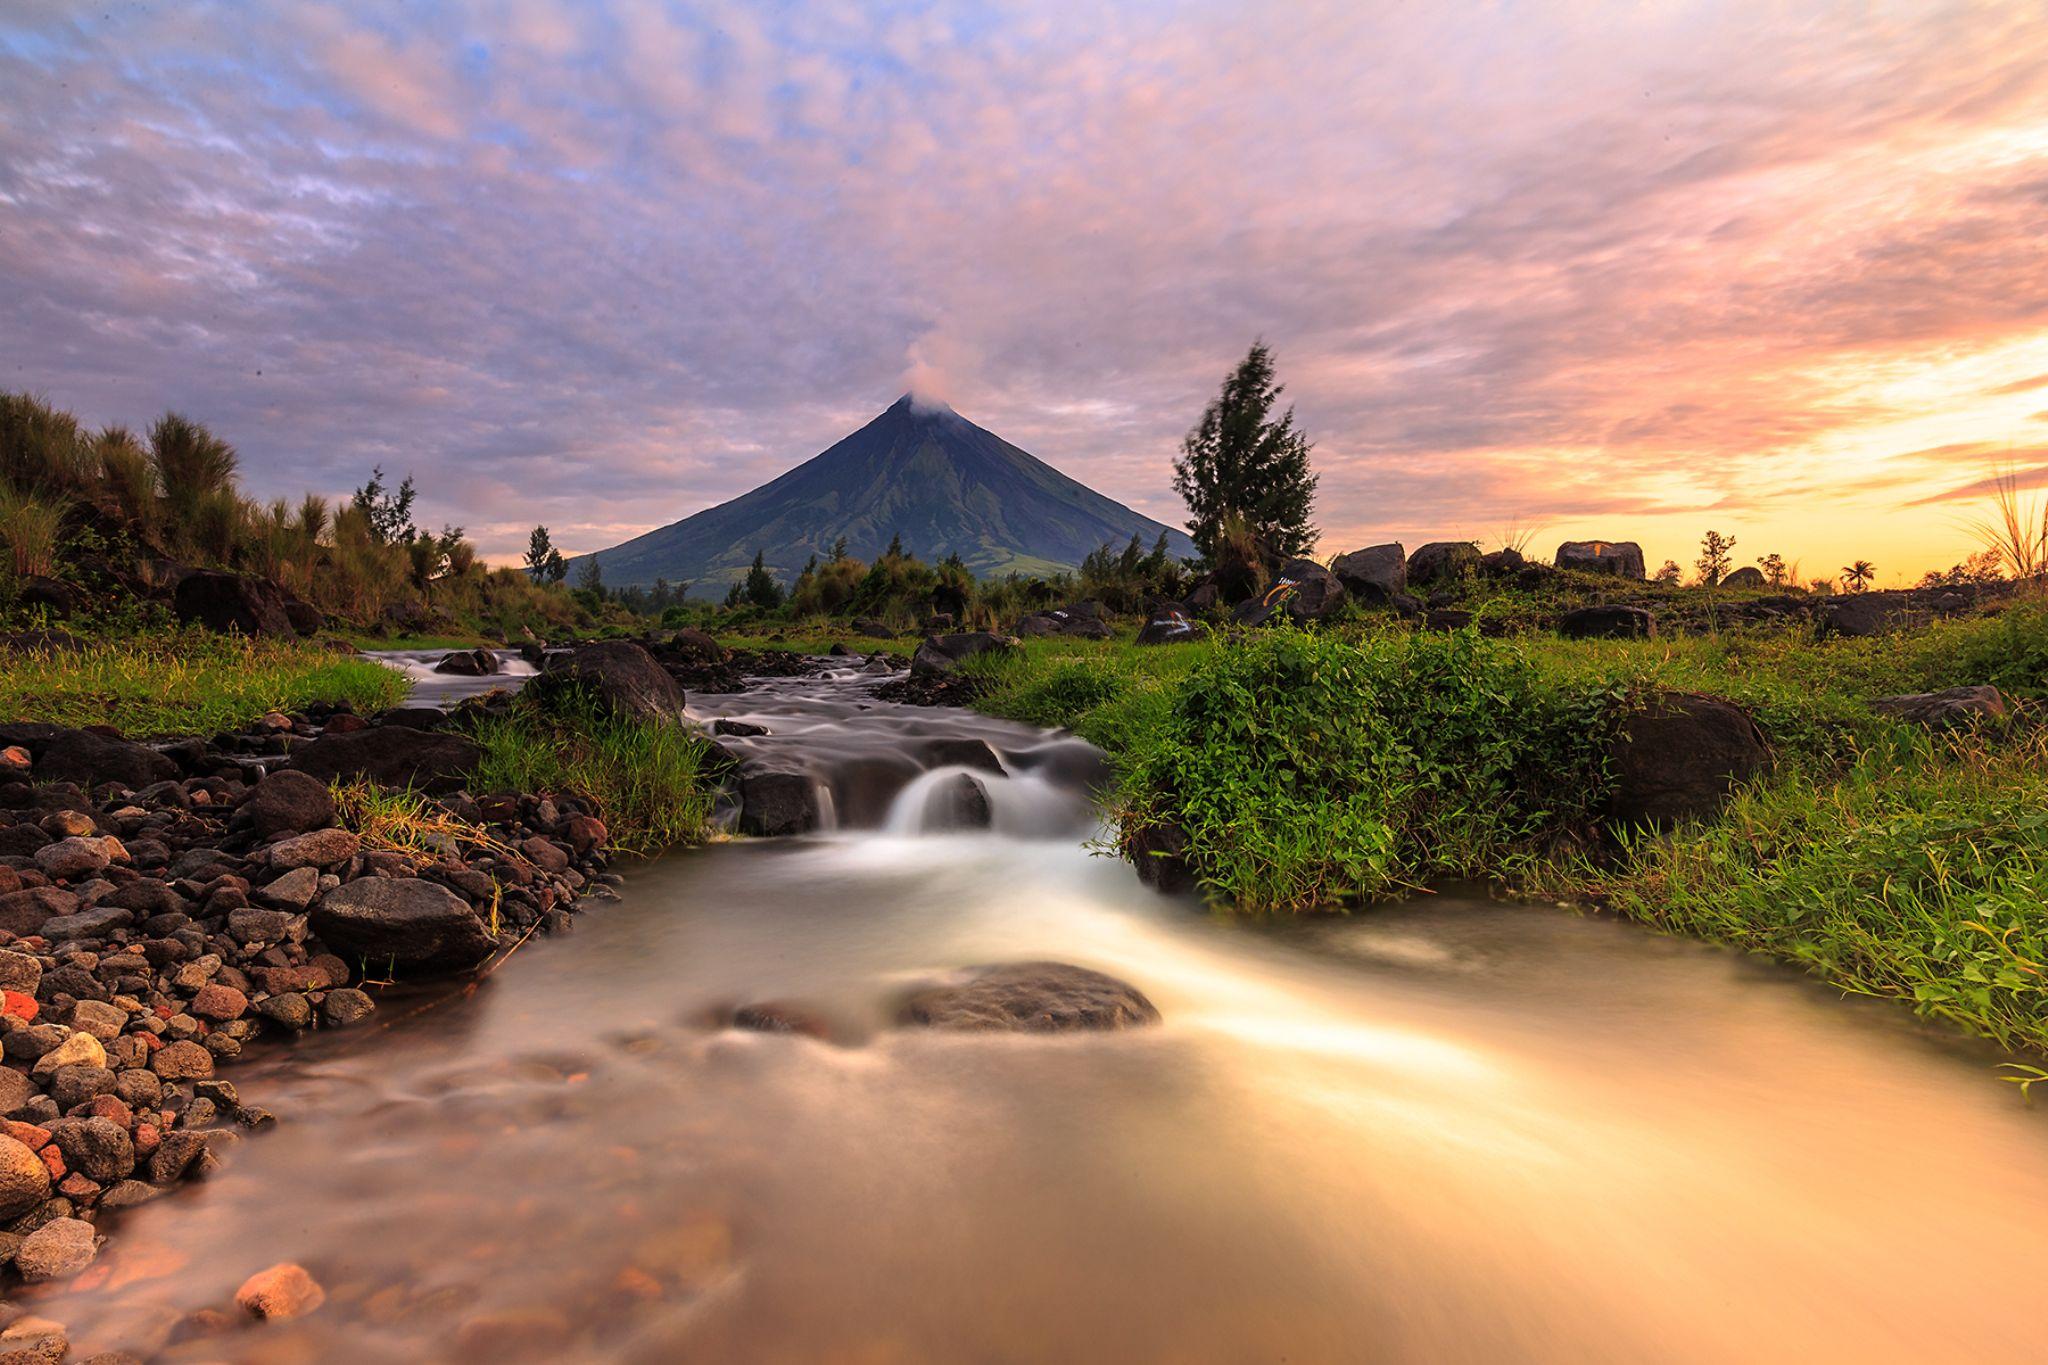 Mayon Volcano by juliustsantos